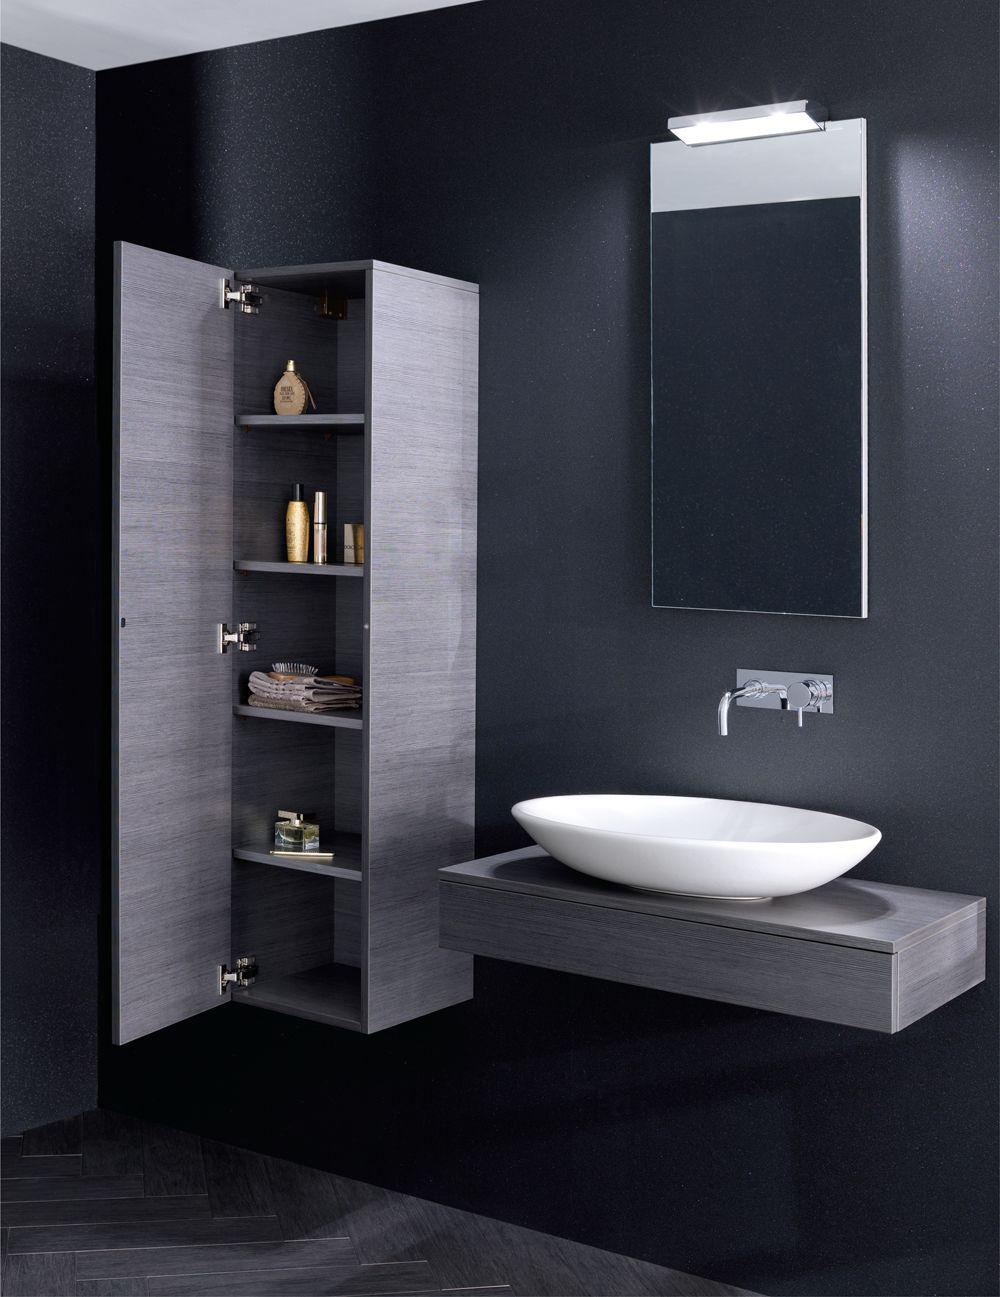 Bathroom experience bathexperience on pinterest